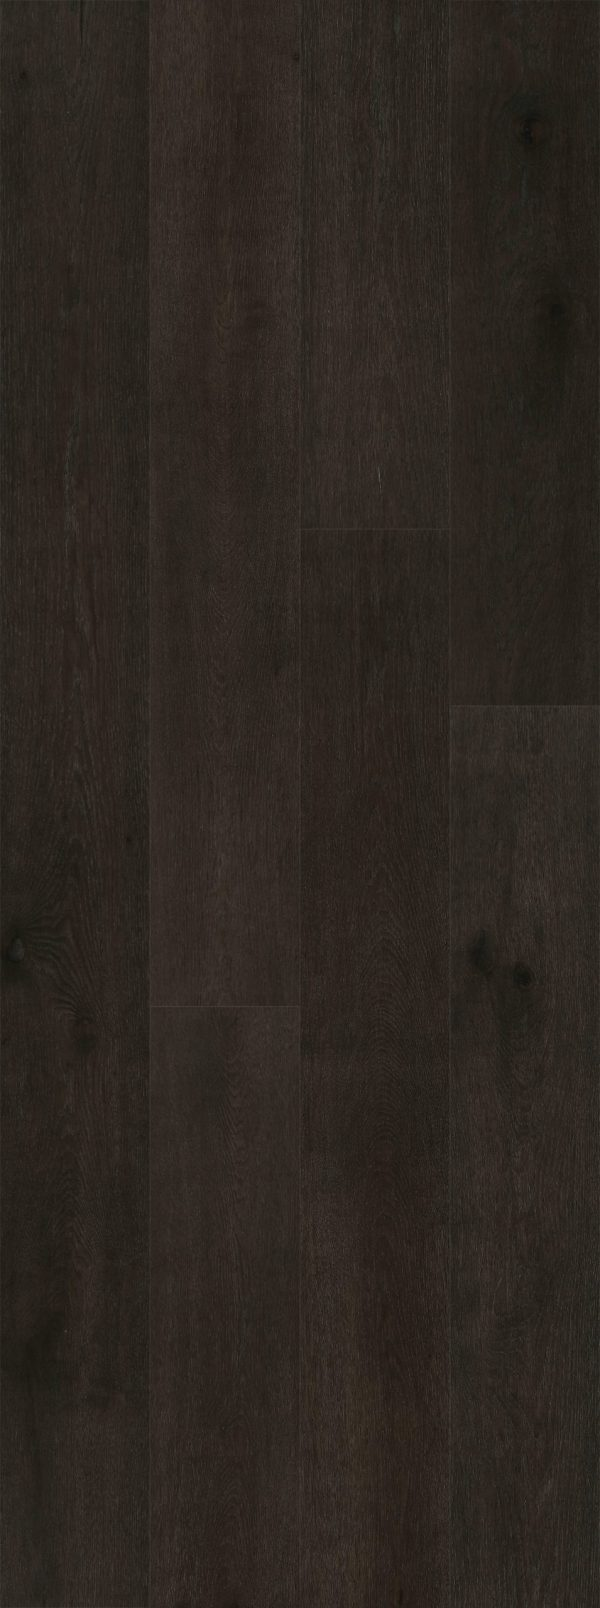 European Oak - Engineered Hardwood - Wire Brushed - CF1021721